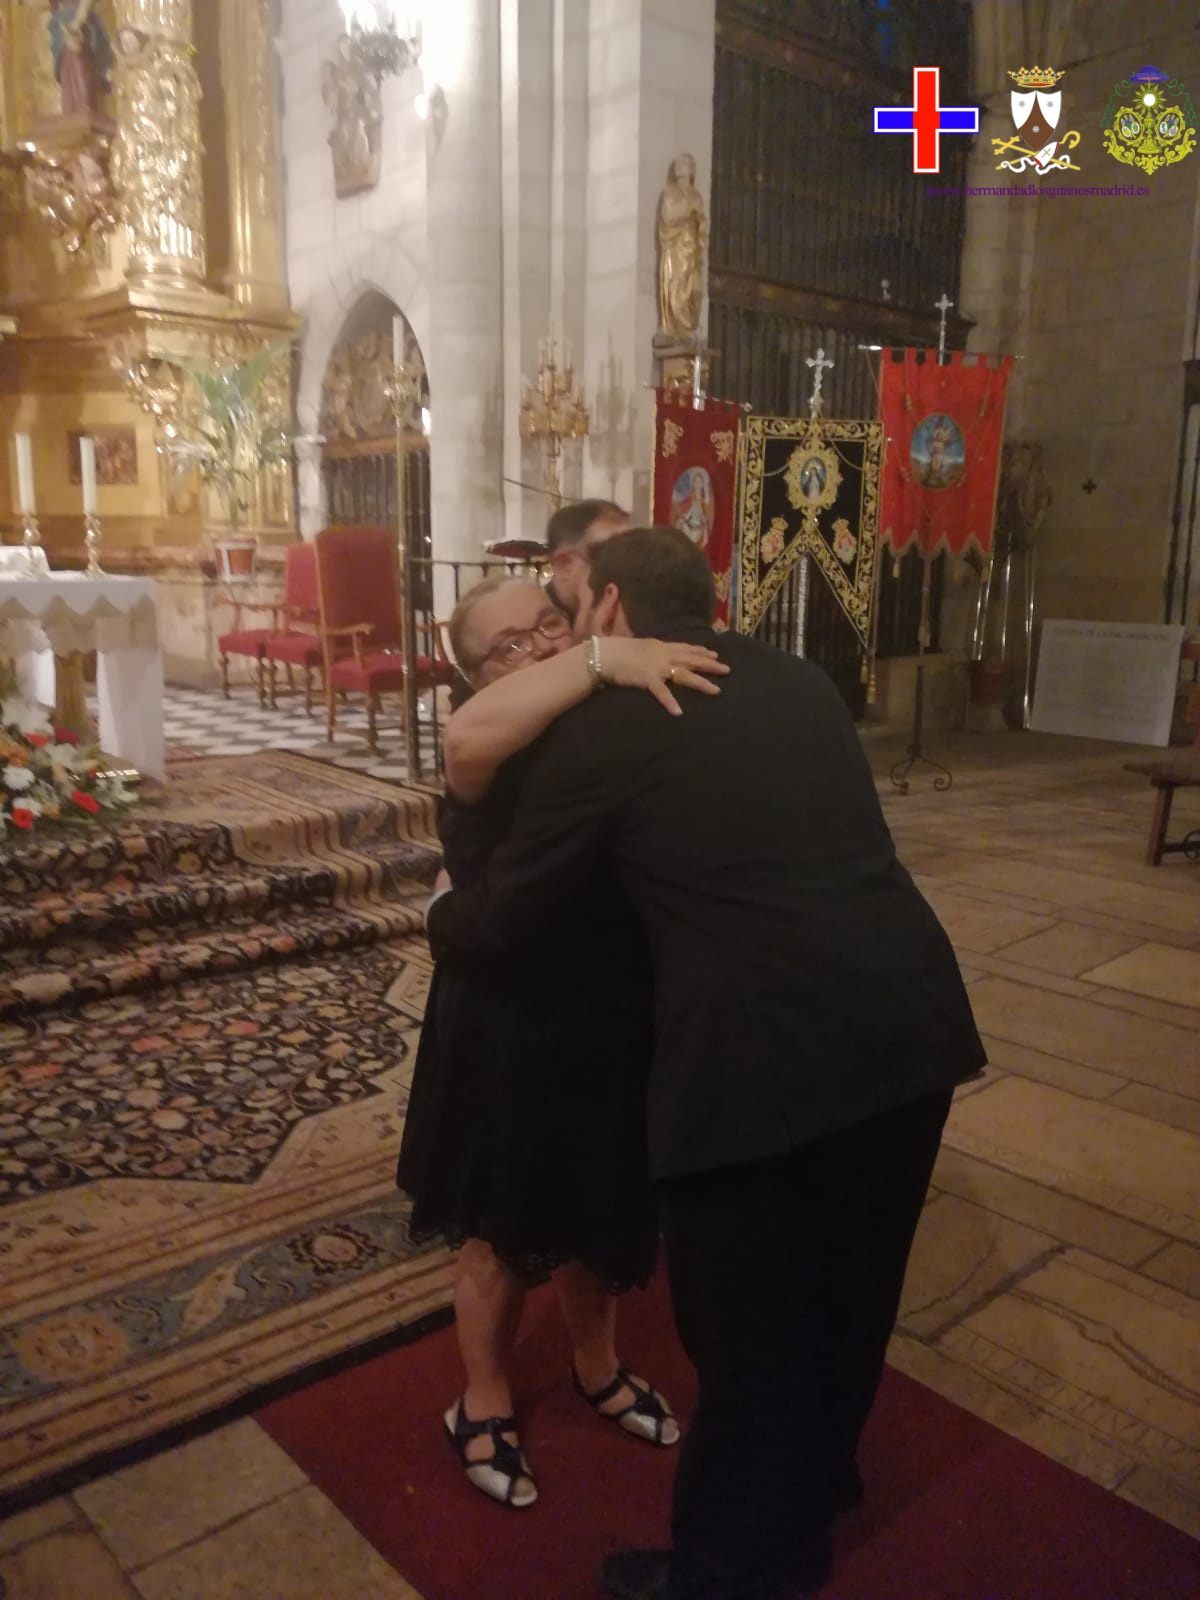 CORPUS-2019-TORRELAGUNA-3-ESCUDO